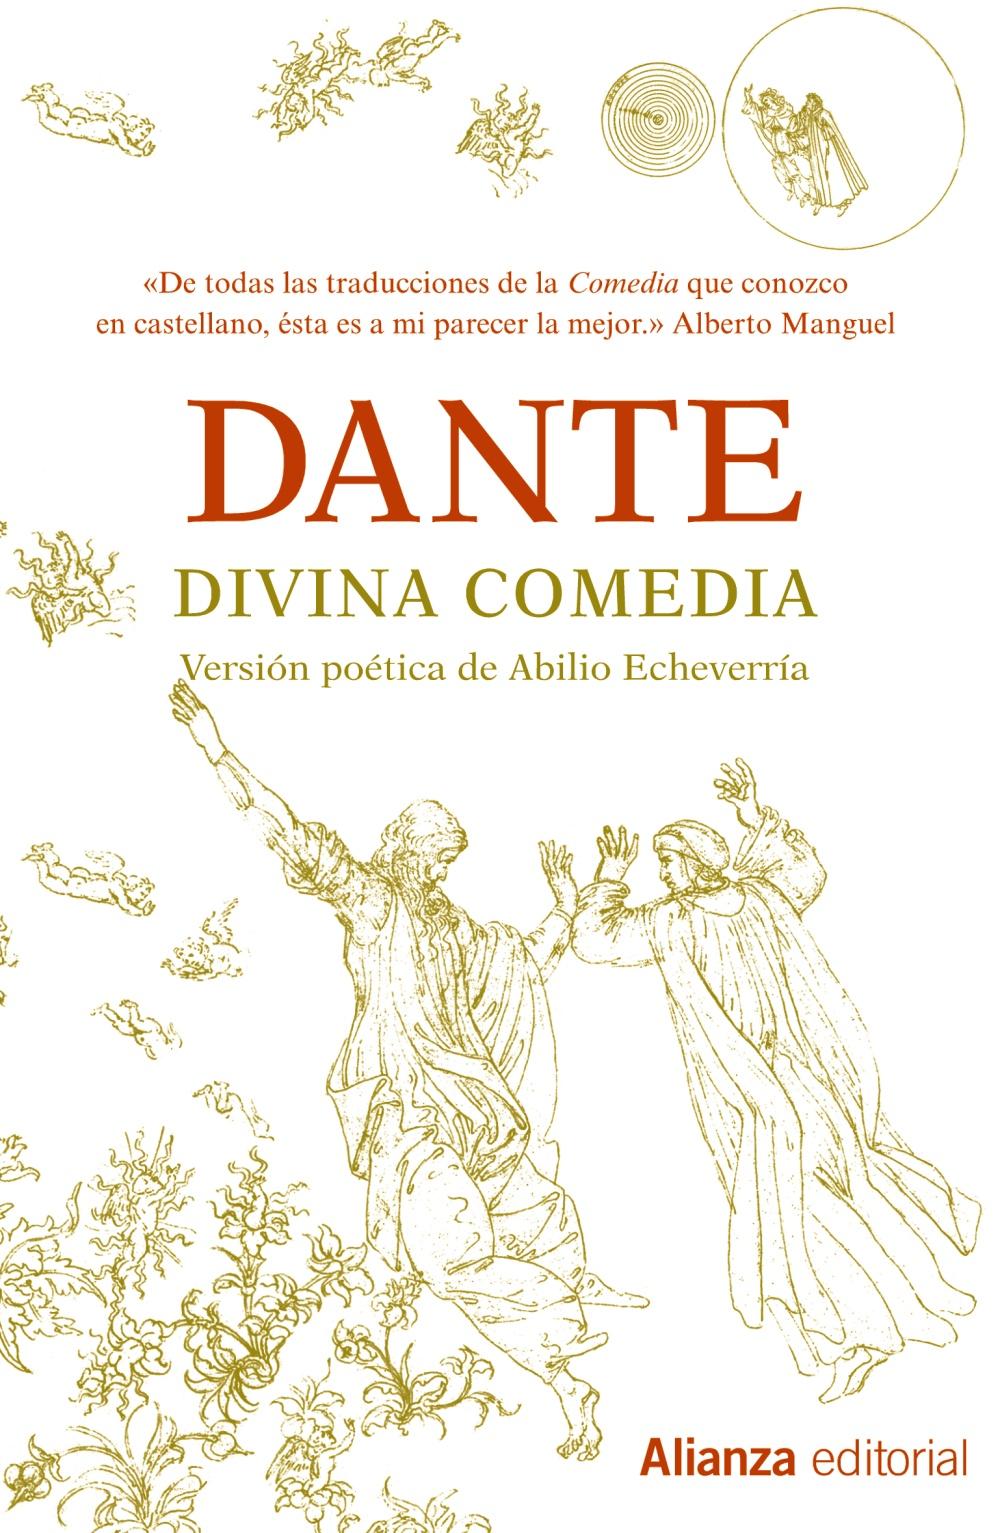 Dante Divina comedia